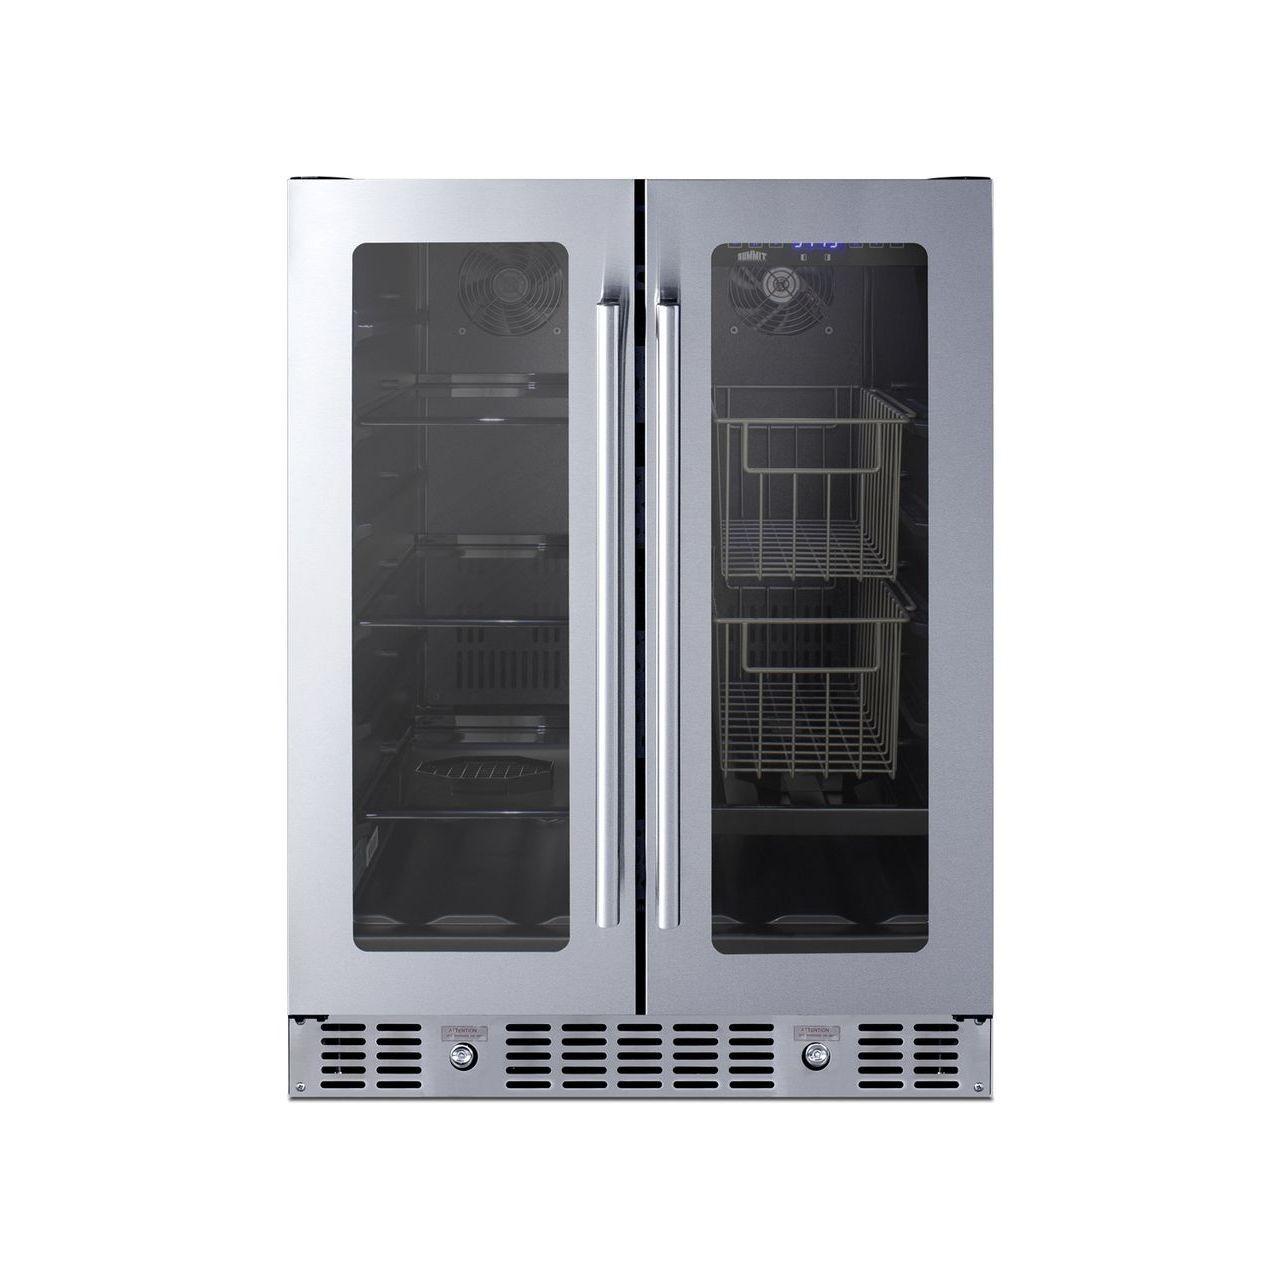 "Summit 24"" ADA Built-In Dual-Zone Refrigerator - Stainless Steel"